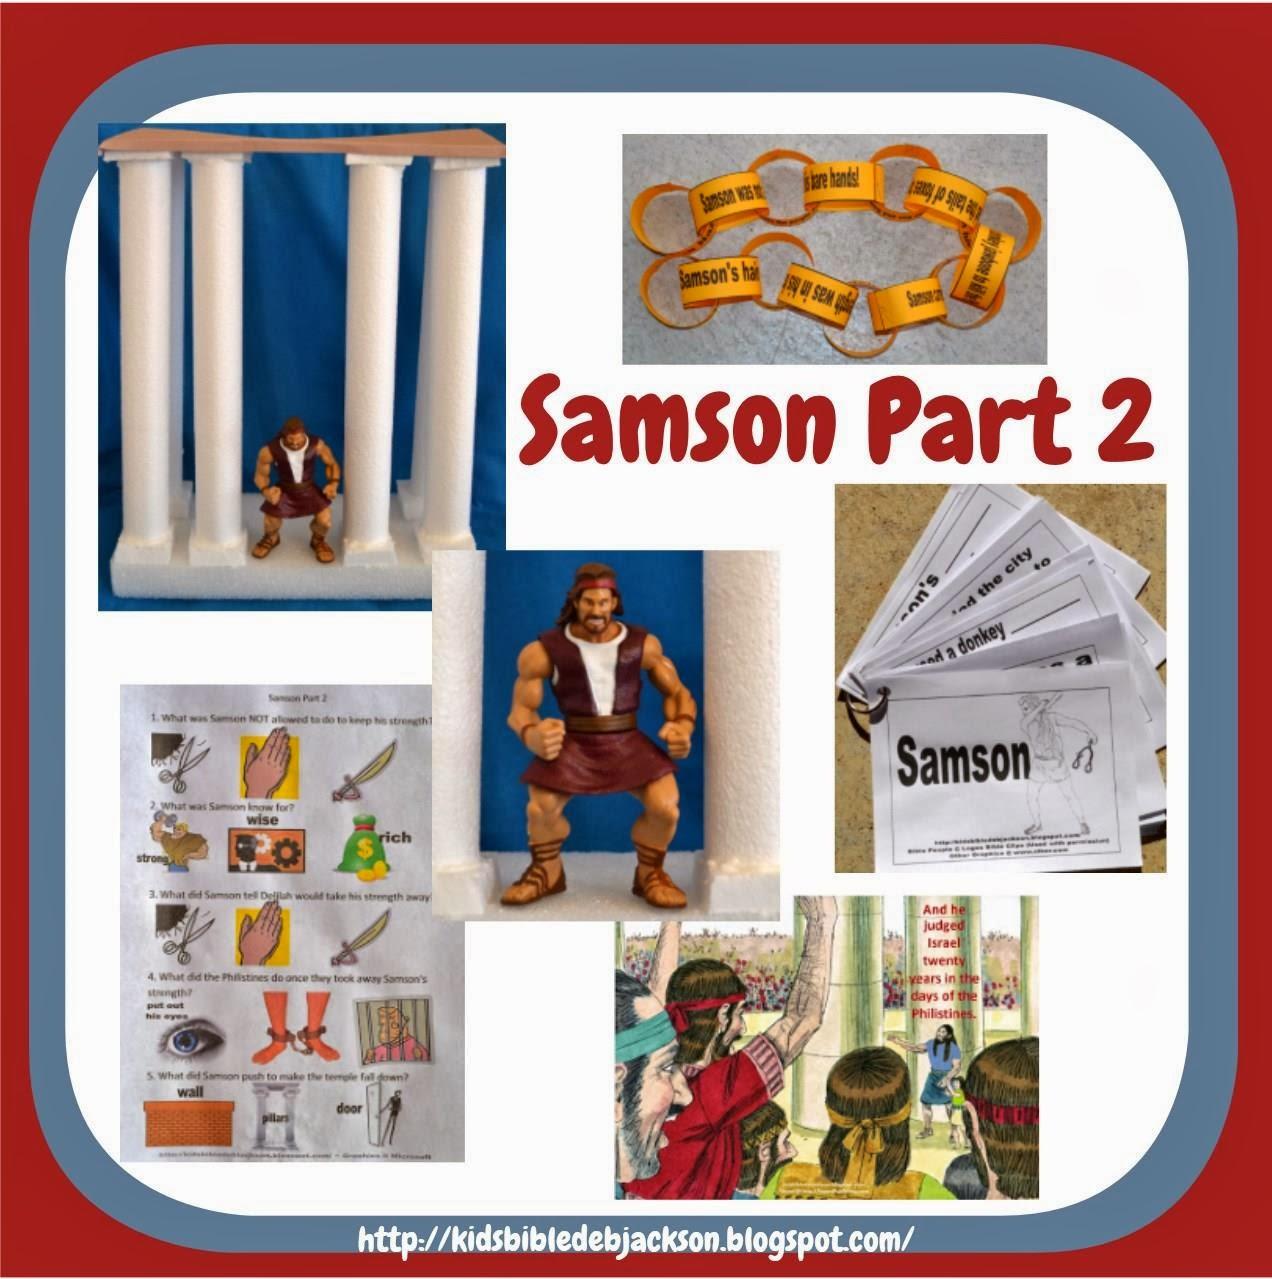 http://kidsbibledebjackson.blogspot.com/2014/01/samson-part-2.html